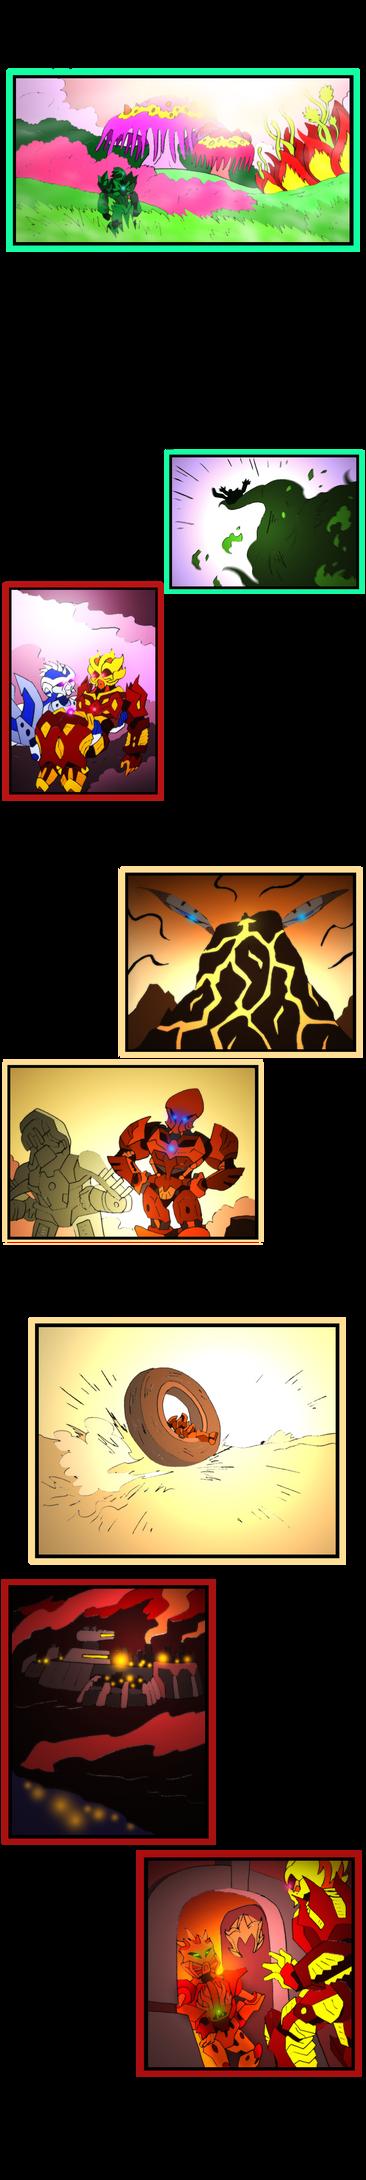 Bionicle- Nova Orbis- Mystery- Chapter 13